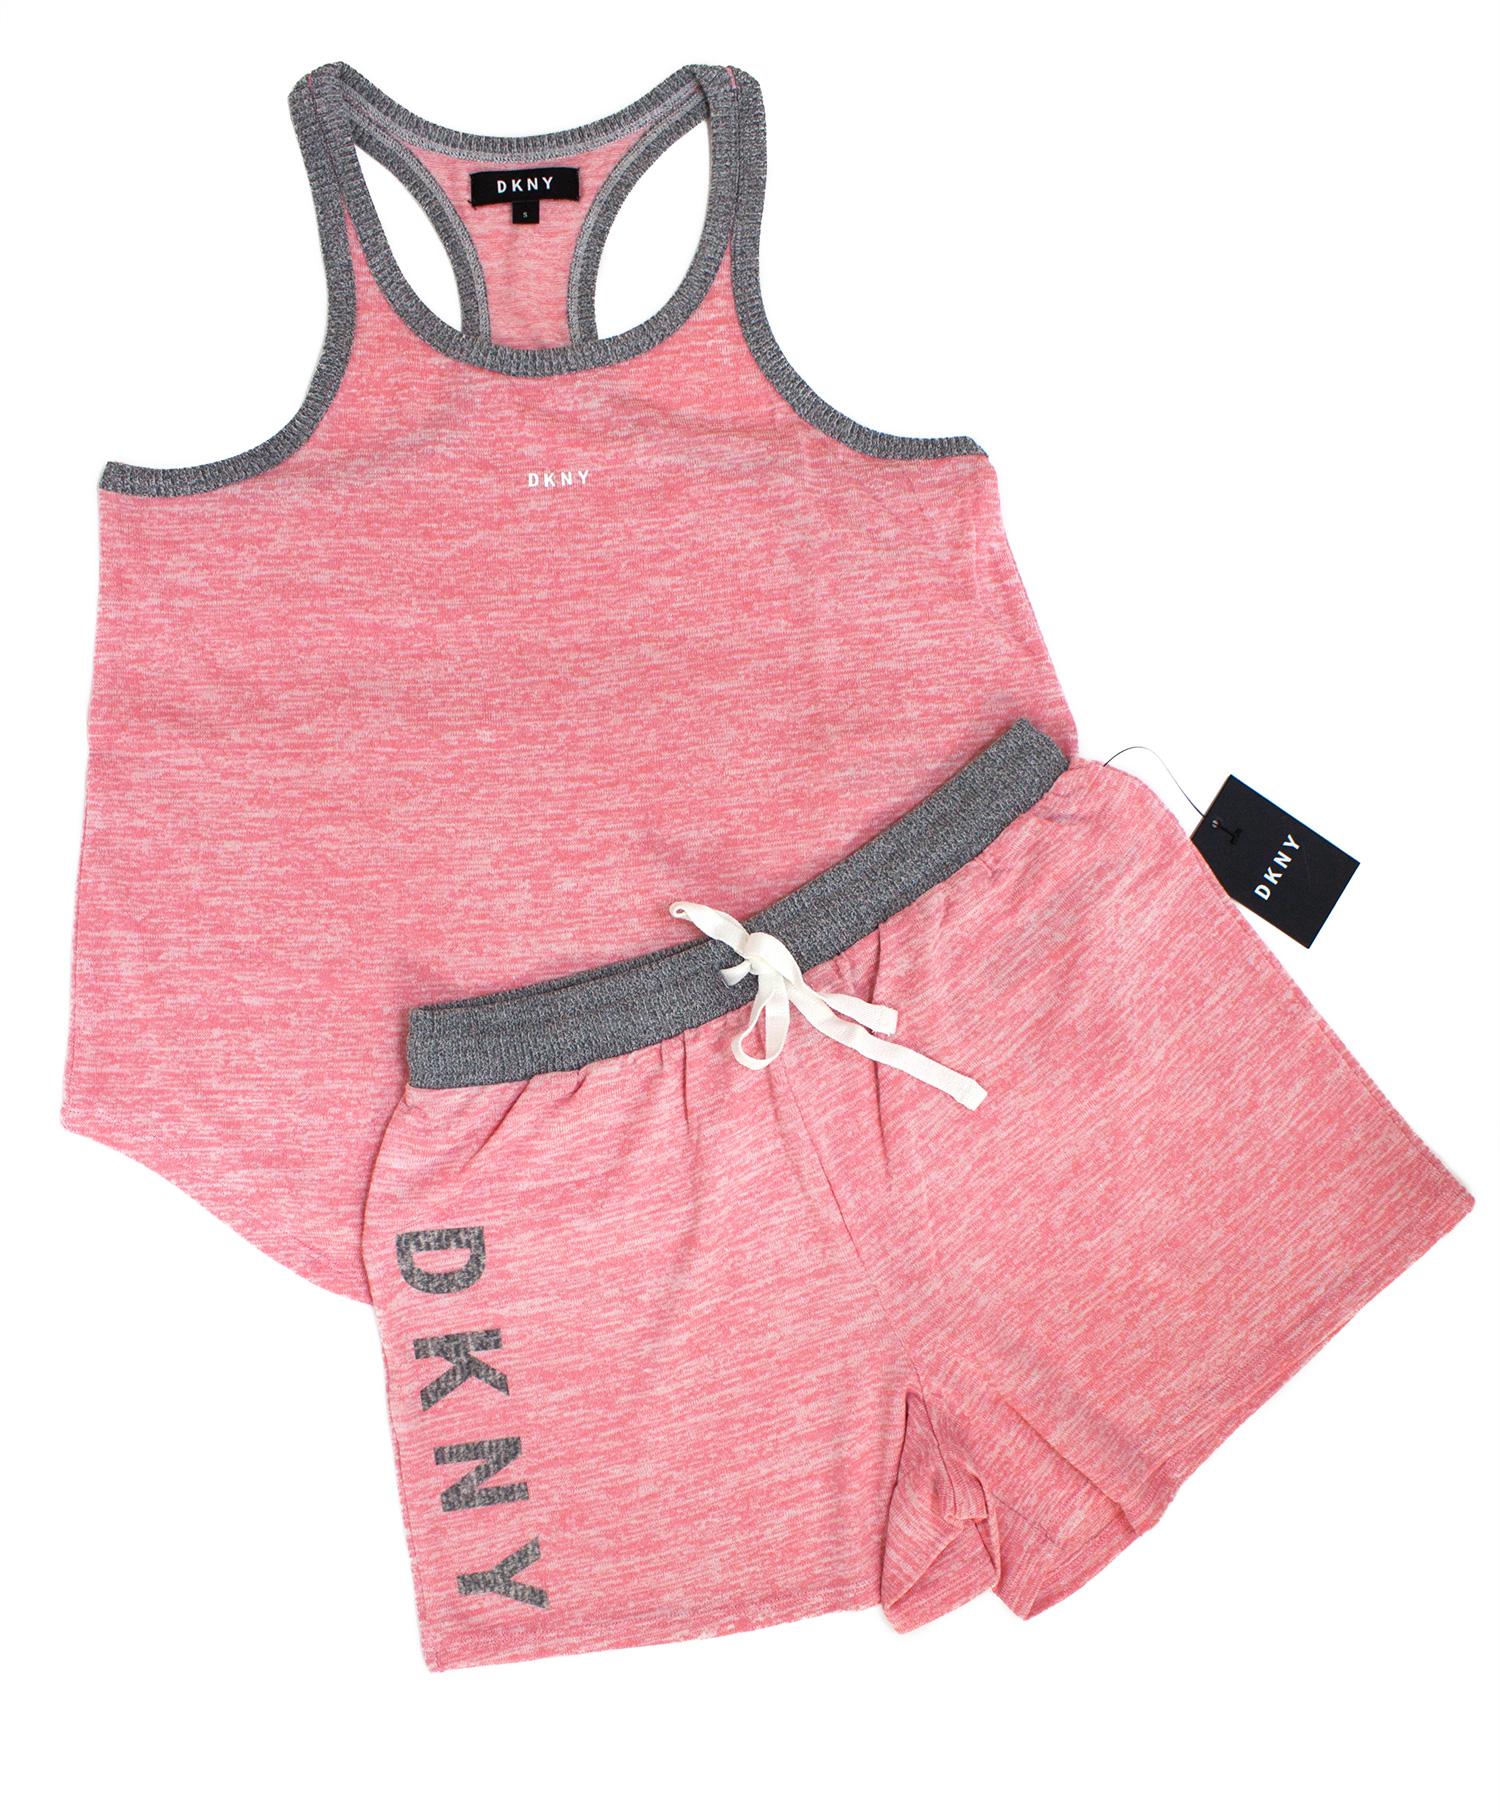 Комплект (майка + шорты) YI3922455 DKNY